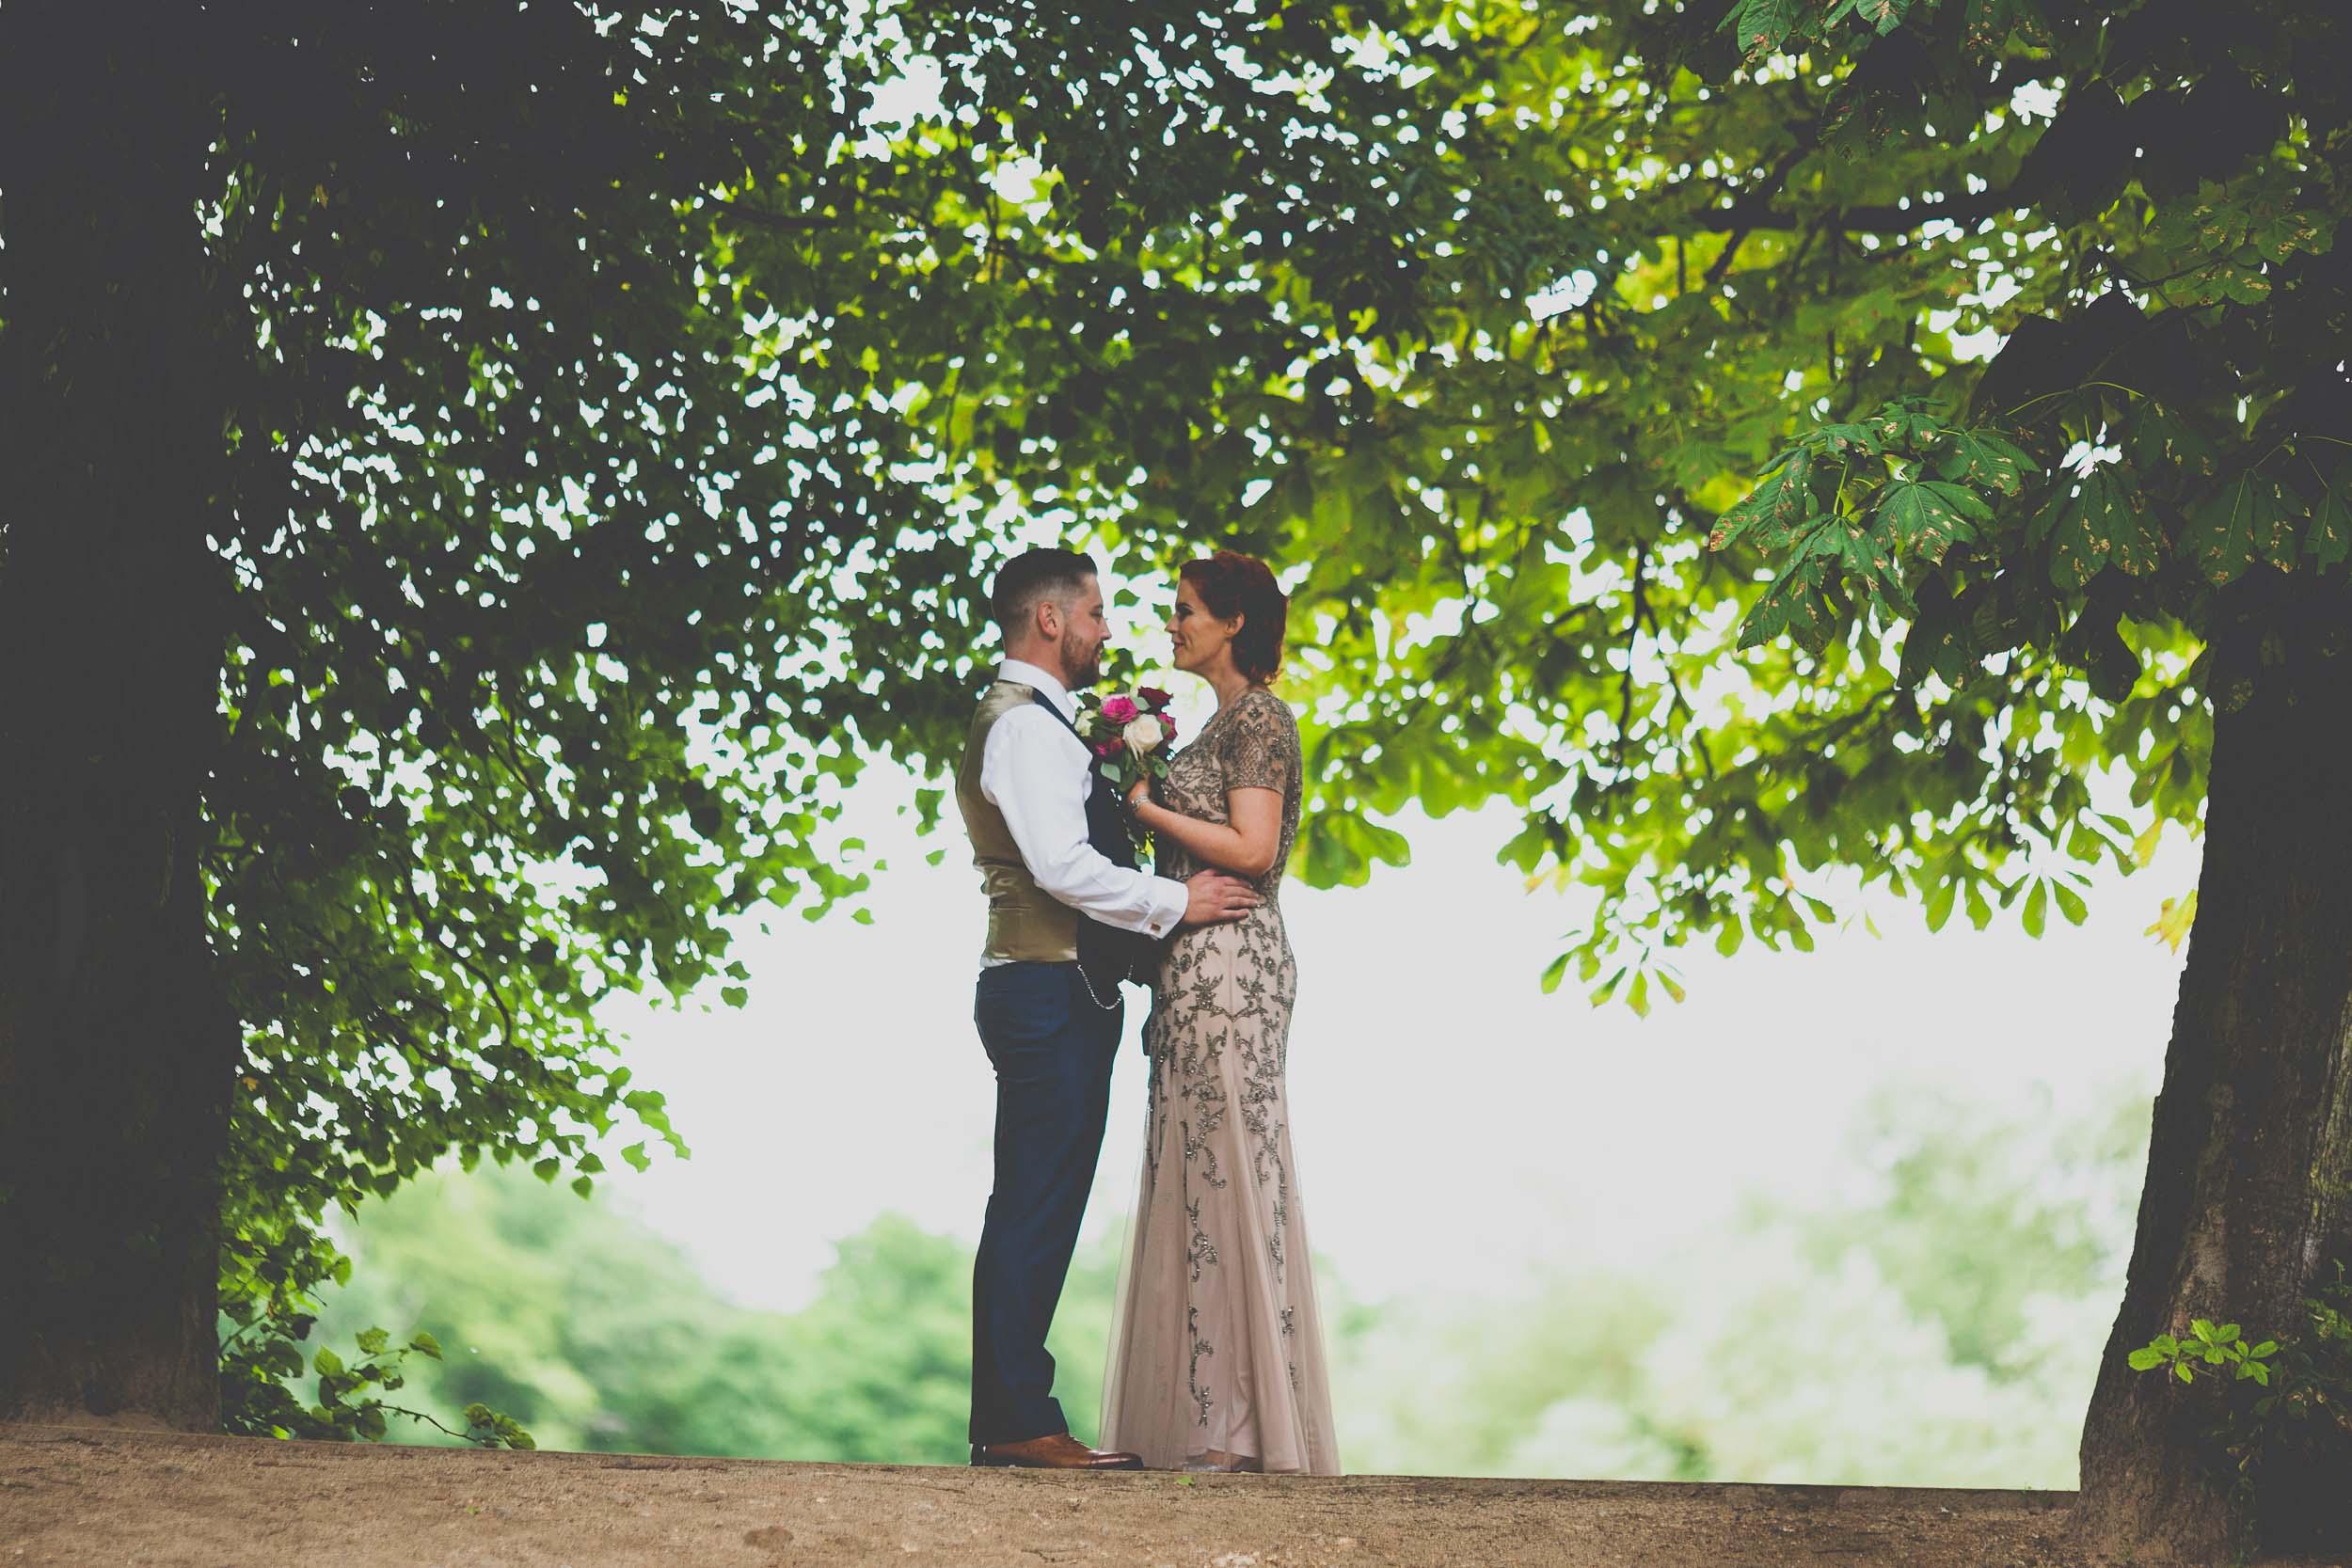 queen-elizabeths-hunting-lodge-epping-forest-wedding261.jpg